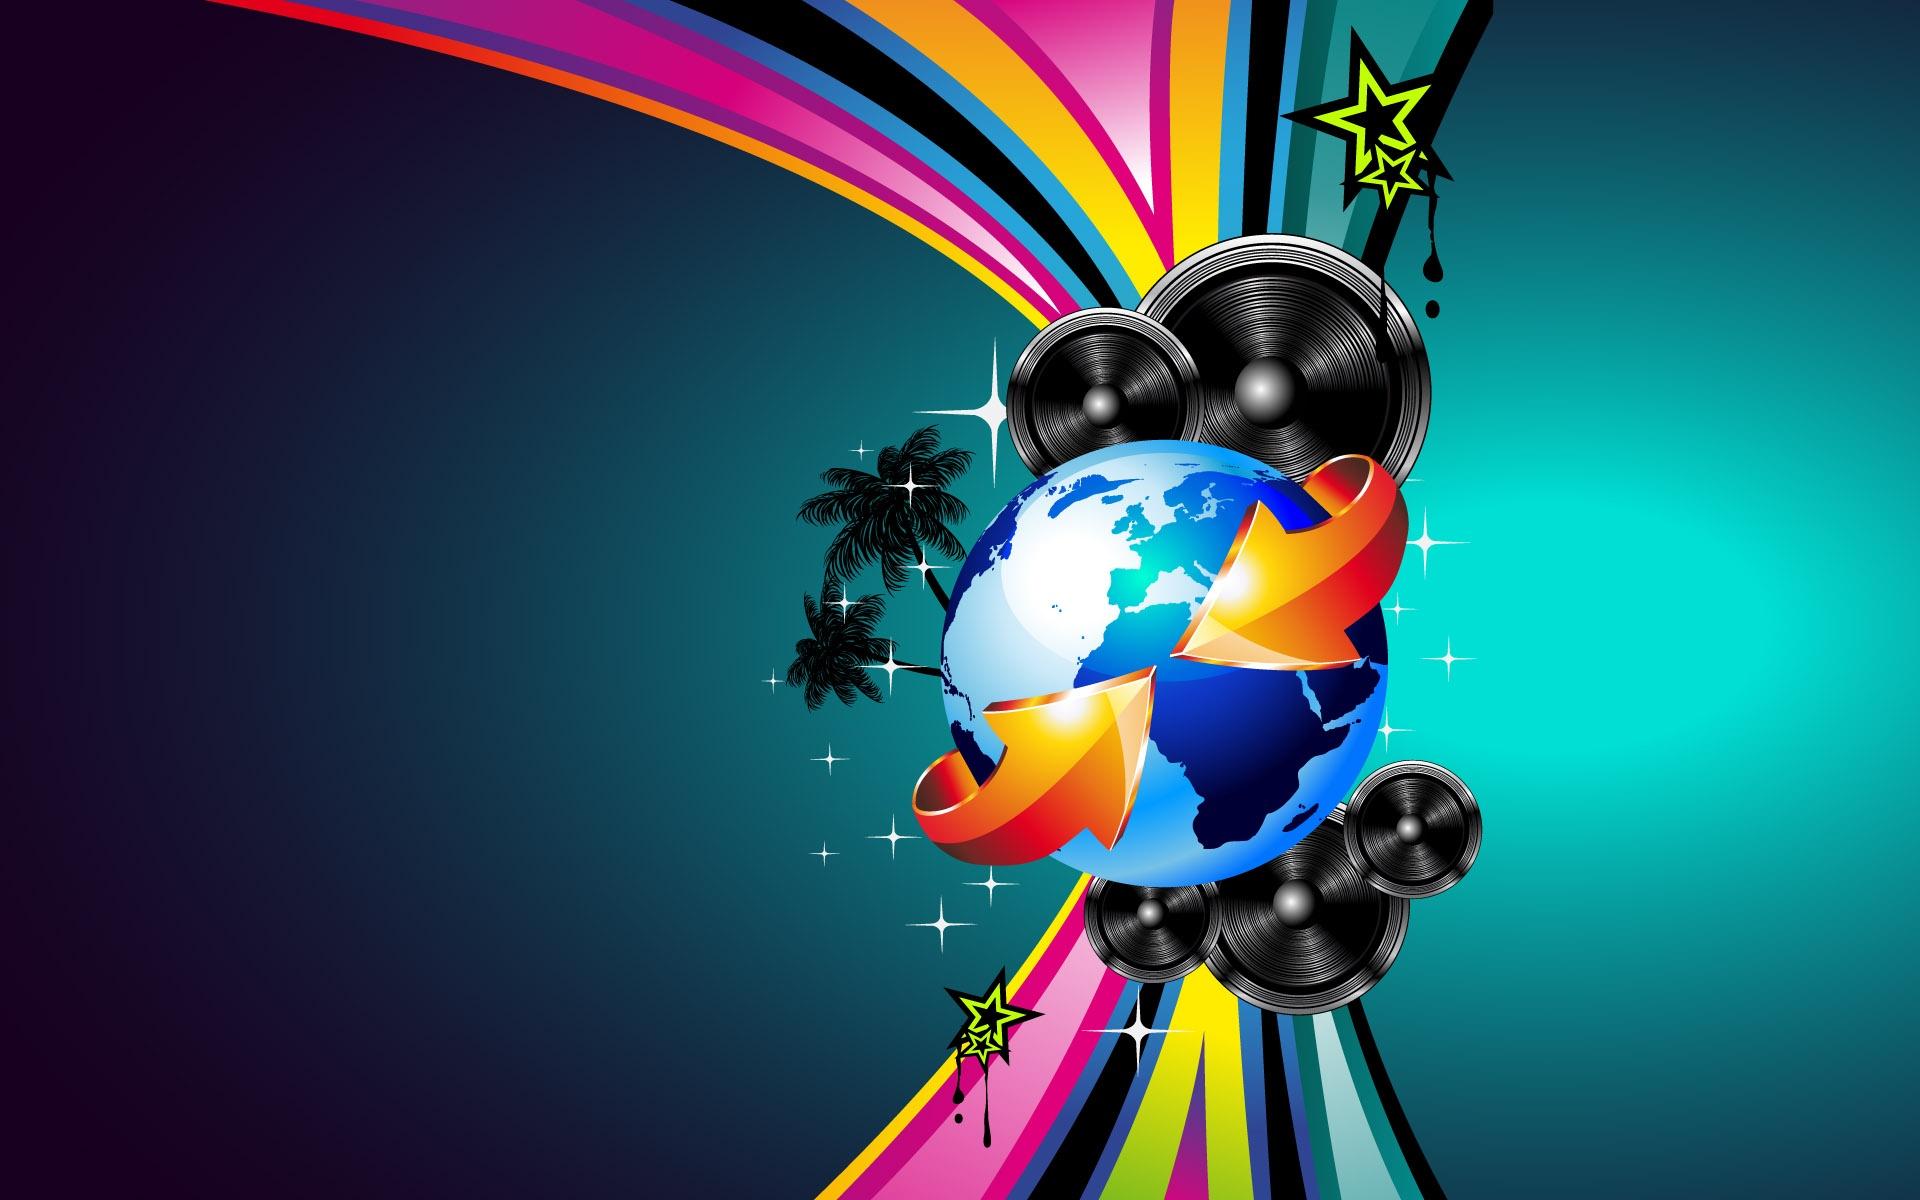 http://4.bp.blogspot.com/-X6CR2YE8SMY/UDiev6prQVI/AAAAAAAAD8g/E_6niGxR_TE/s1920/cool-vector-52-1200.jpg